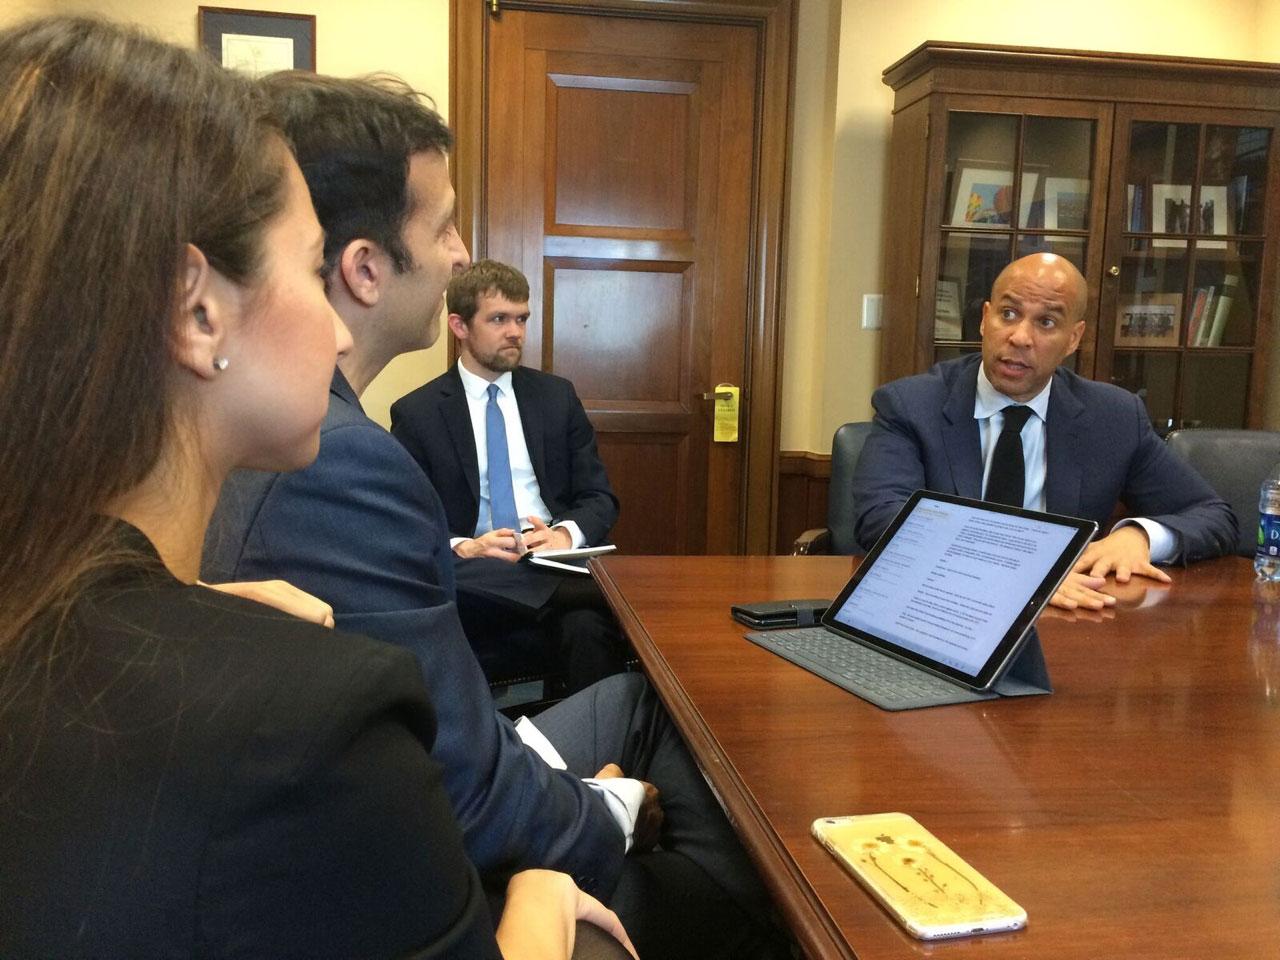 With Senator Cory Booker